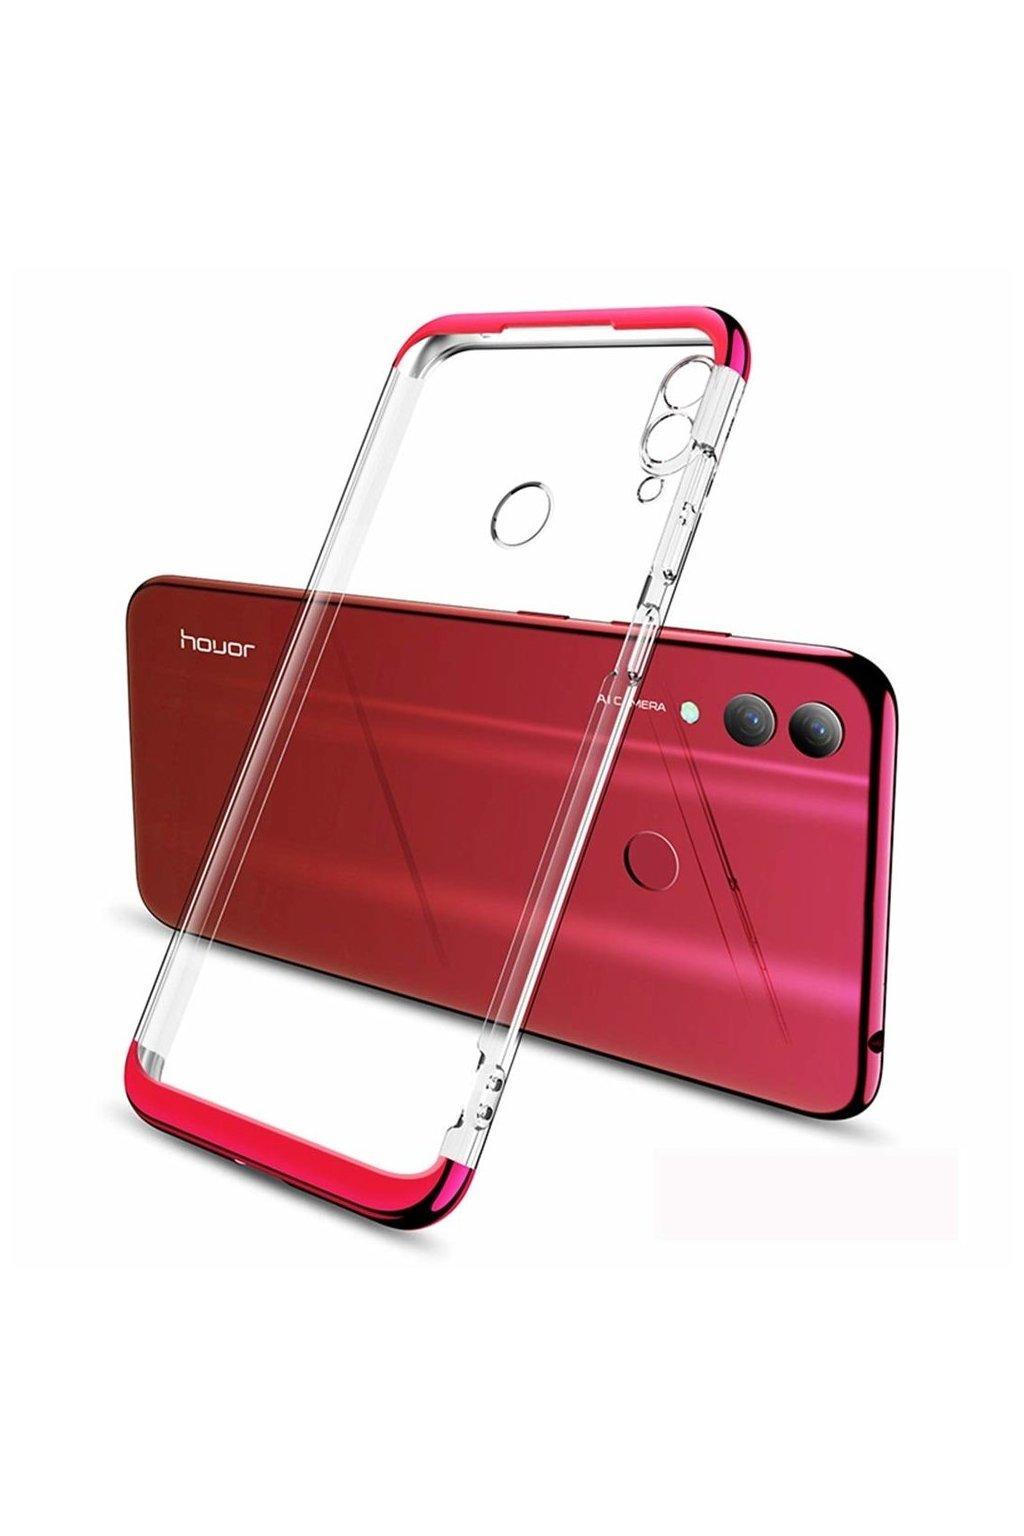 eng pl GKK 360 Phantom Case Front and Back transparent Case Full Body Cover Huawei P Smart 2019 red 49746 1